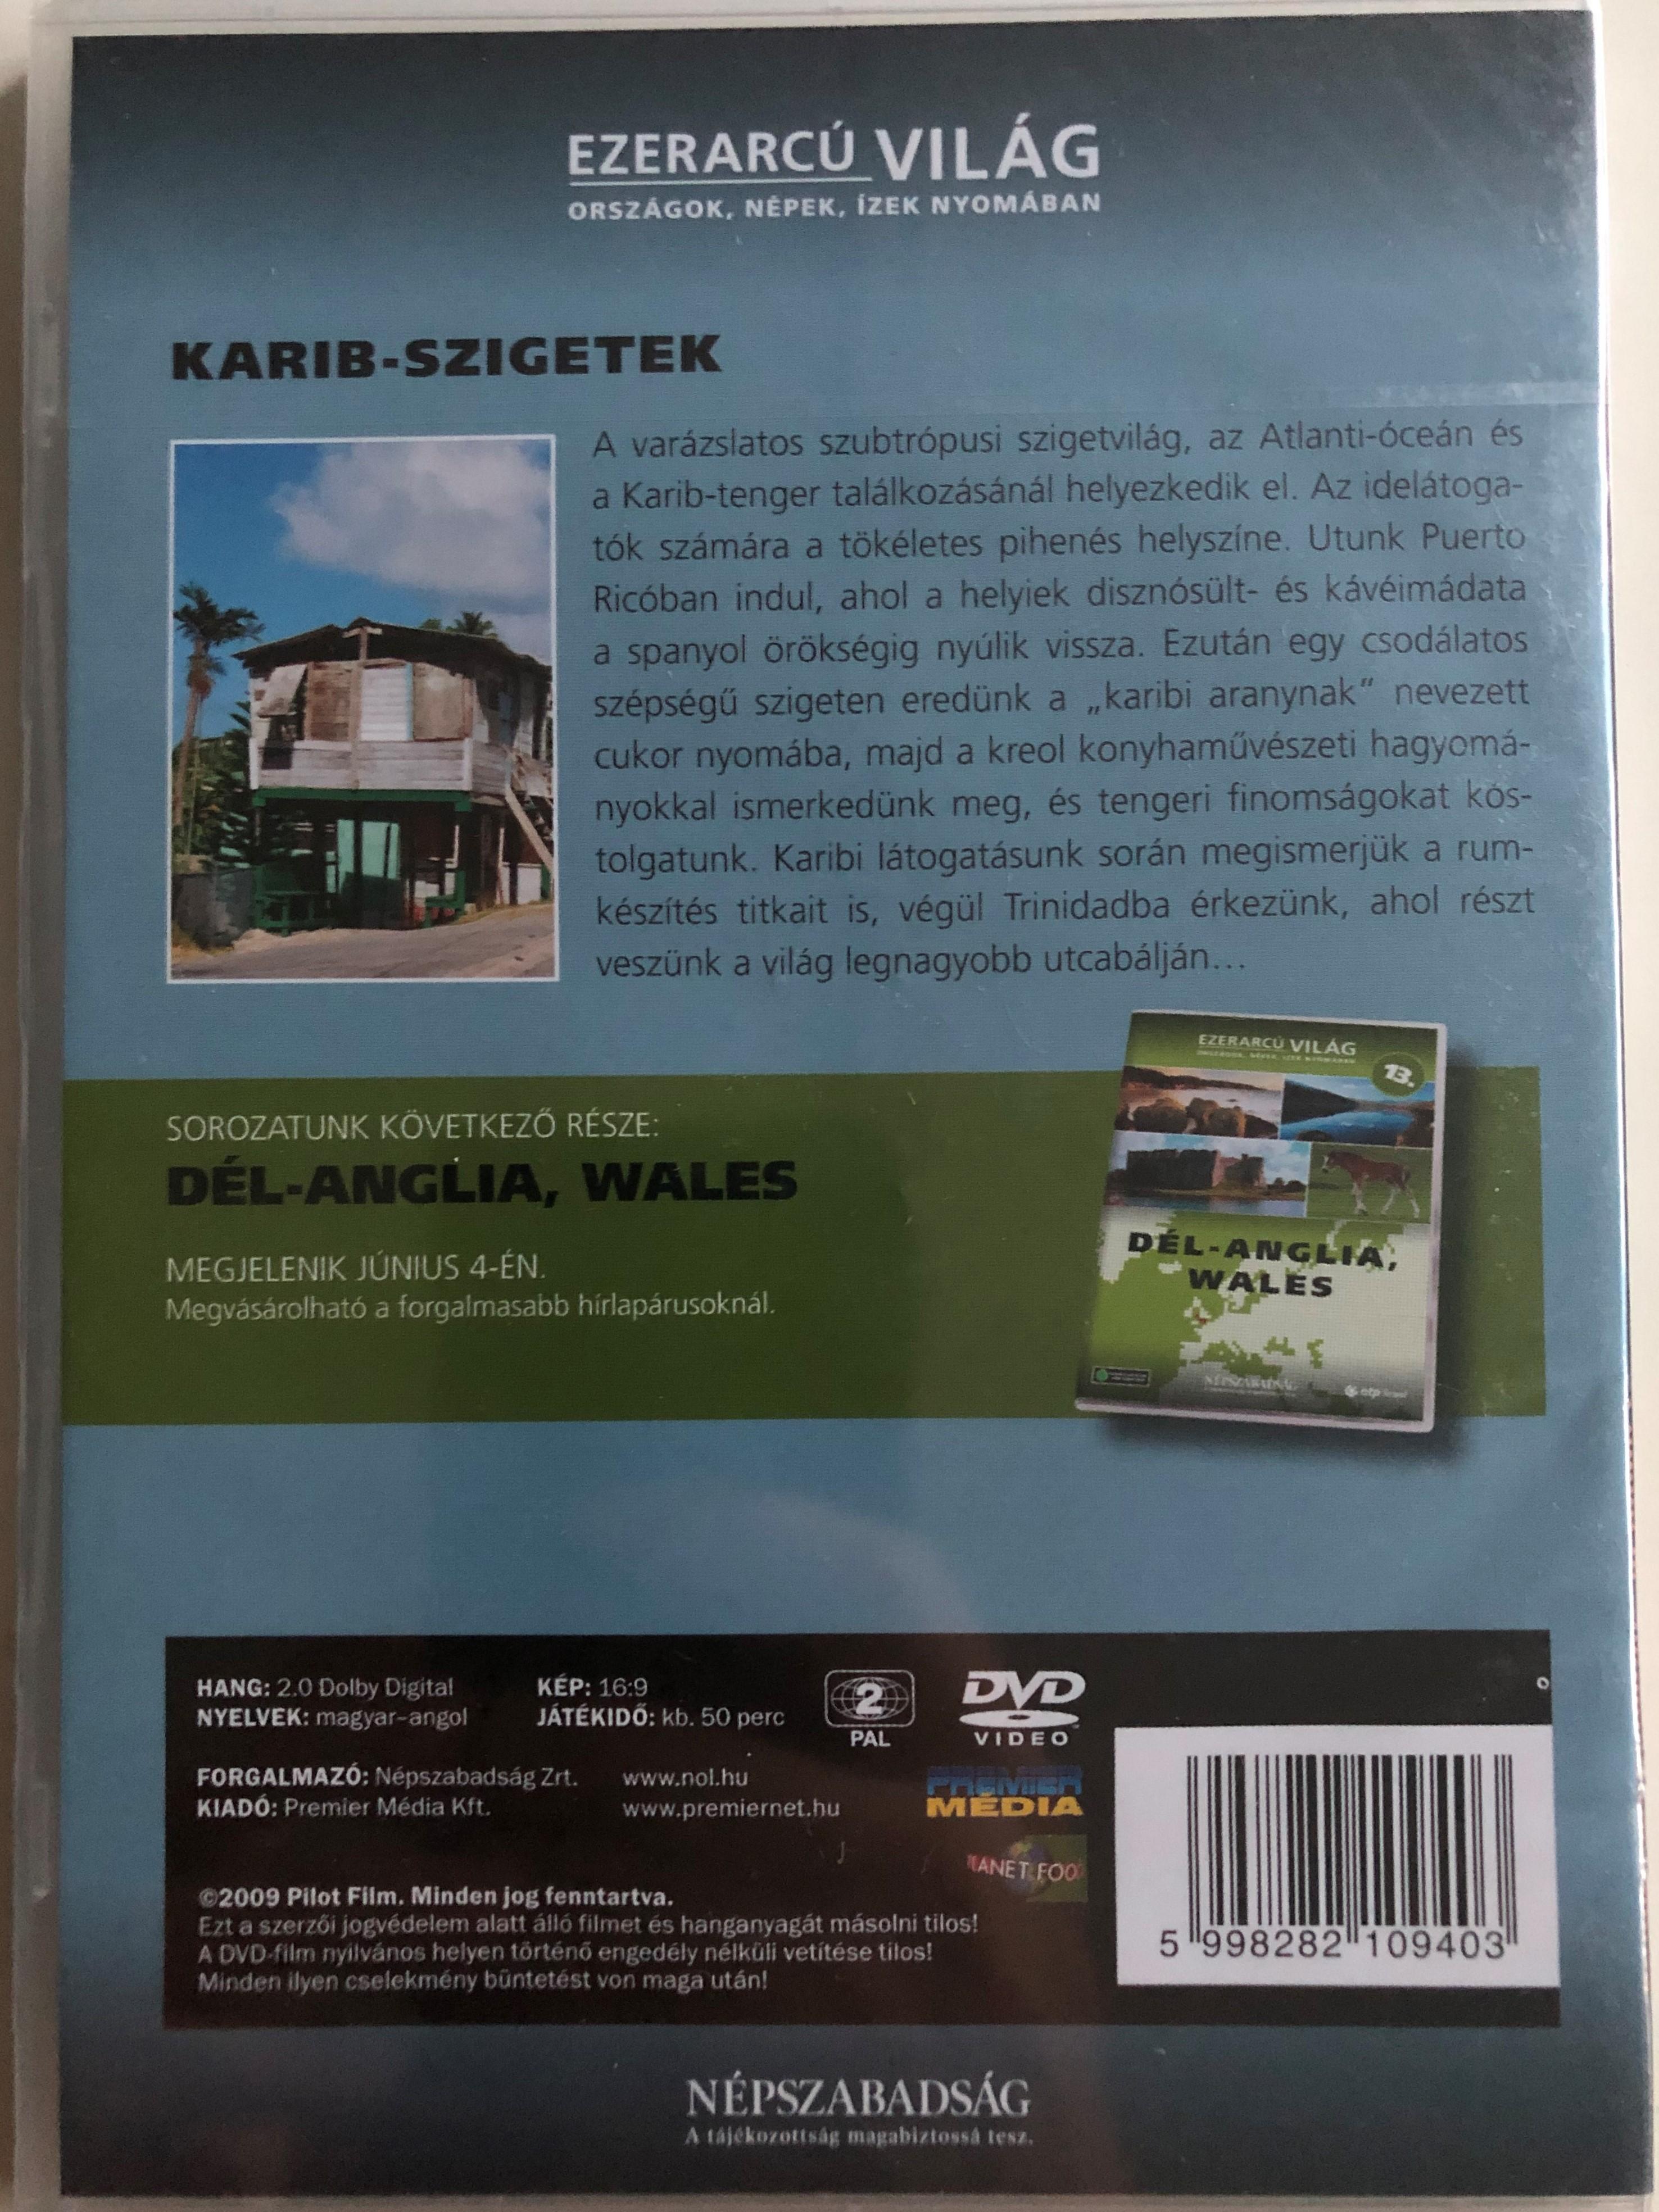 ezerarc-vil-g-vol.-12-karib-szigetek-caribbean-islands-dvd-2009-orsz-gok-n-pek-zek-nyom-ban-20-x-dvd-set-2009-n-pszabads-g-premier-media-pilot-film-documentary-series-about-our-world-1787203108-.jpg